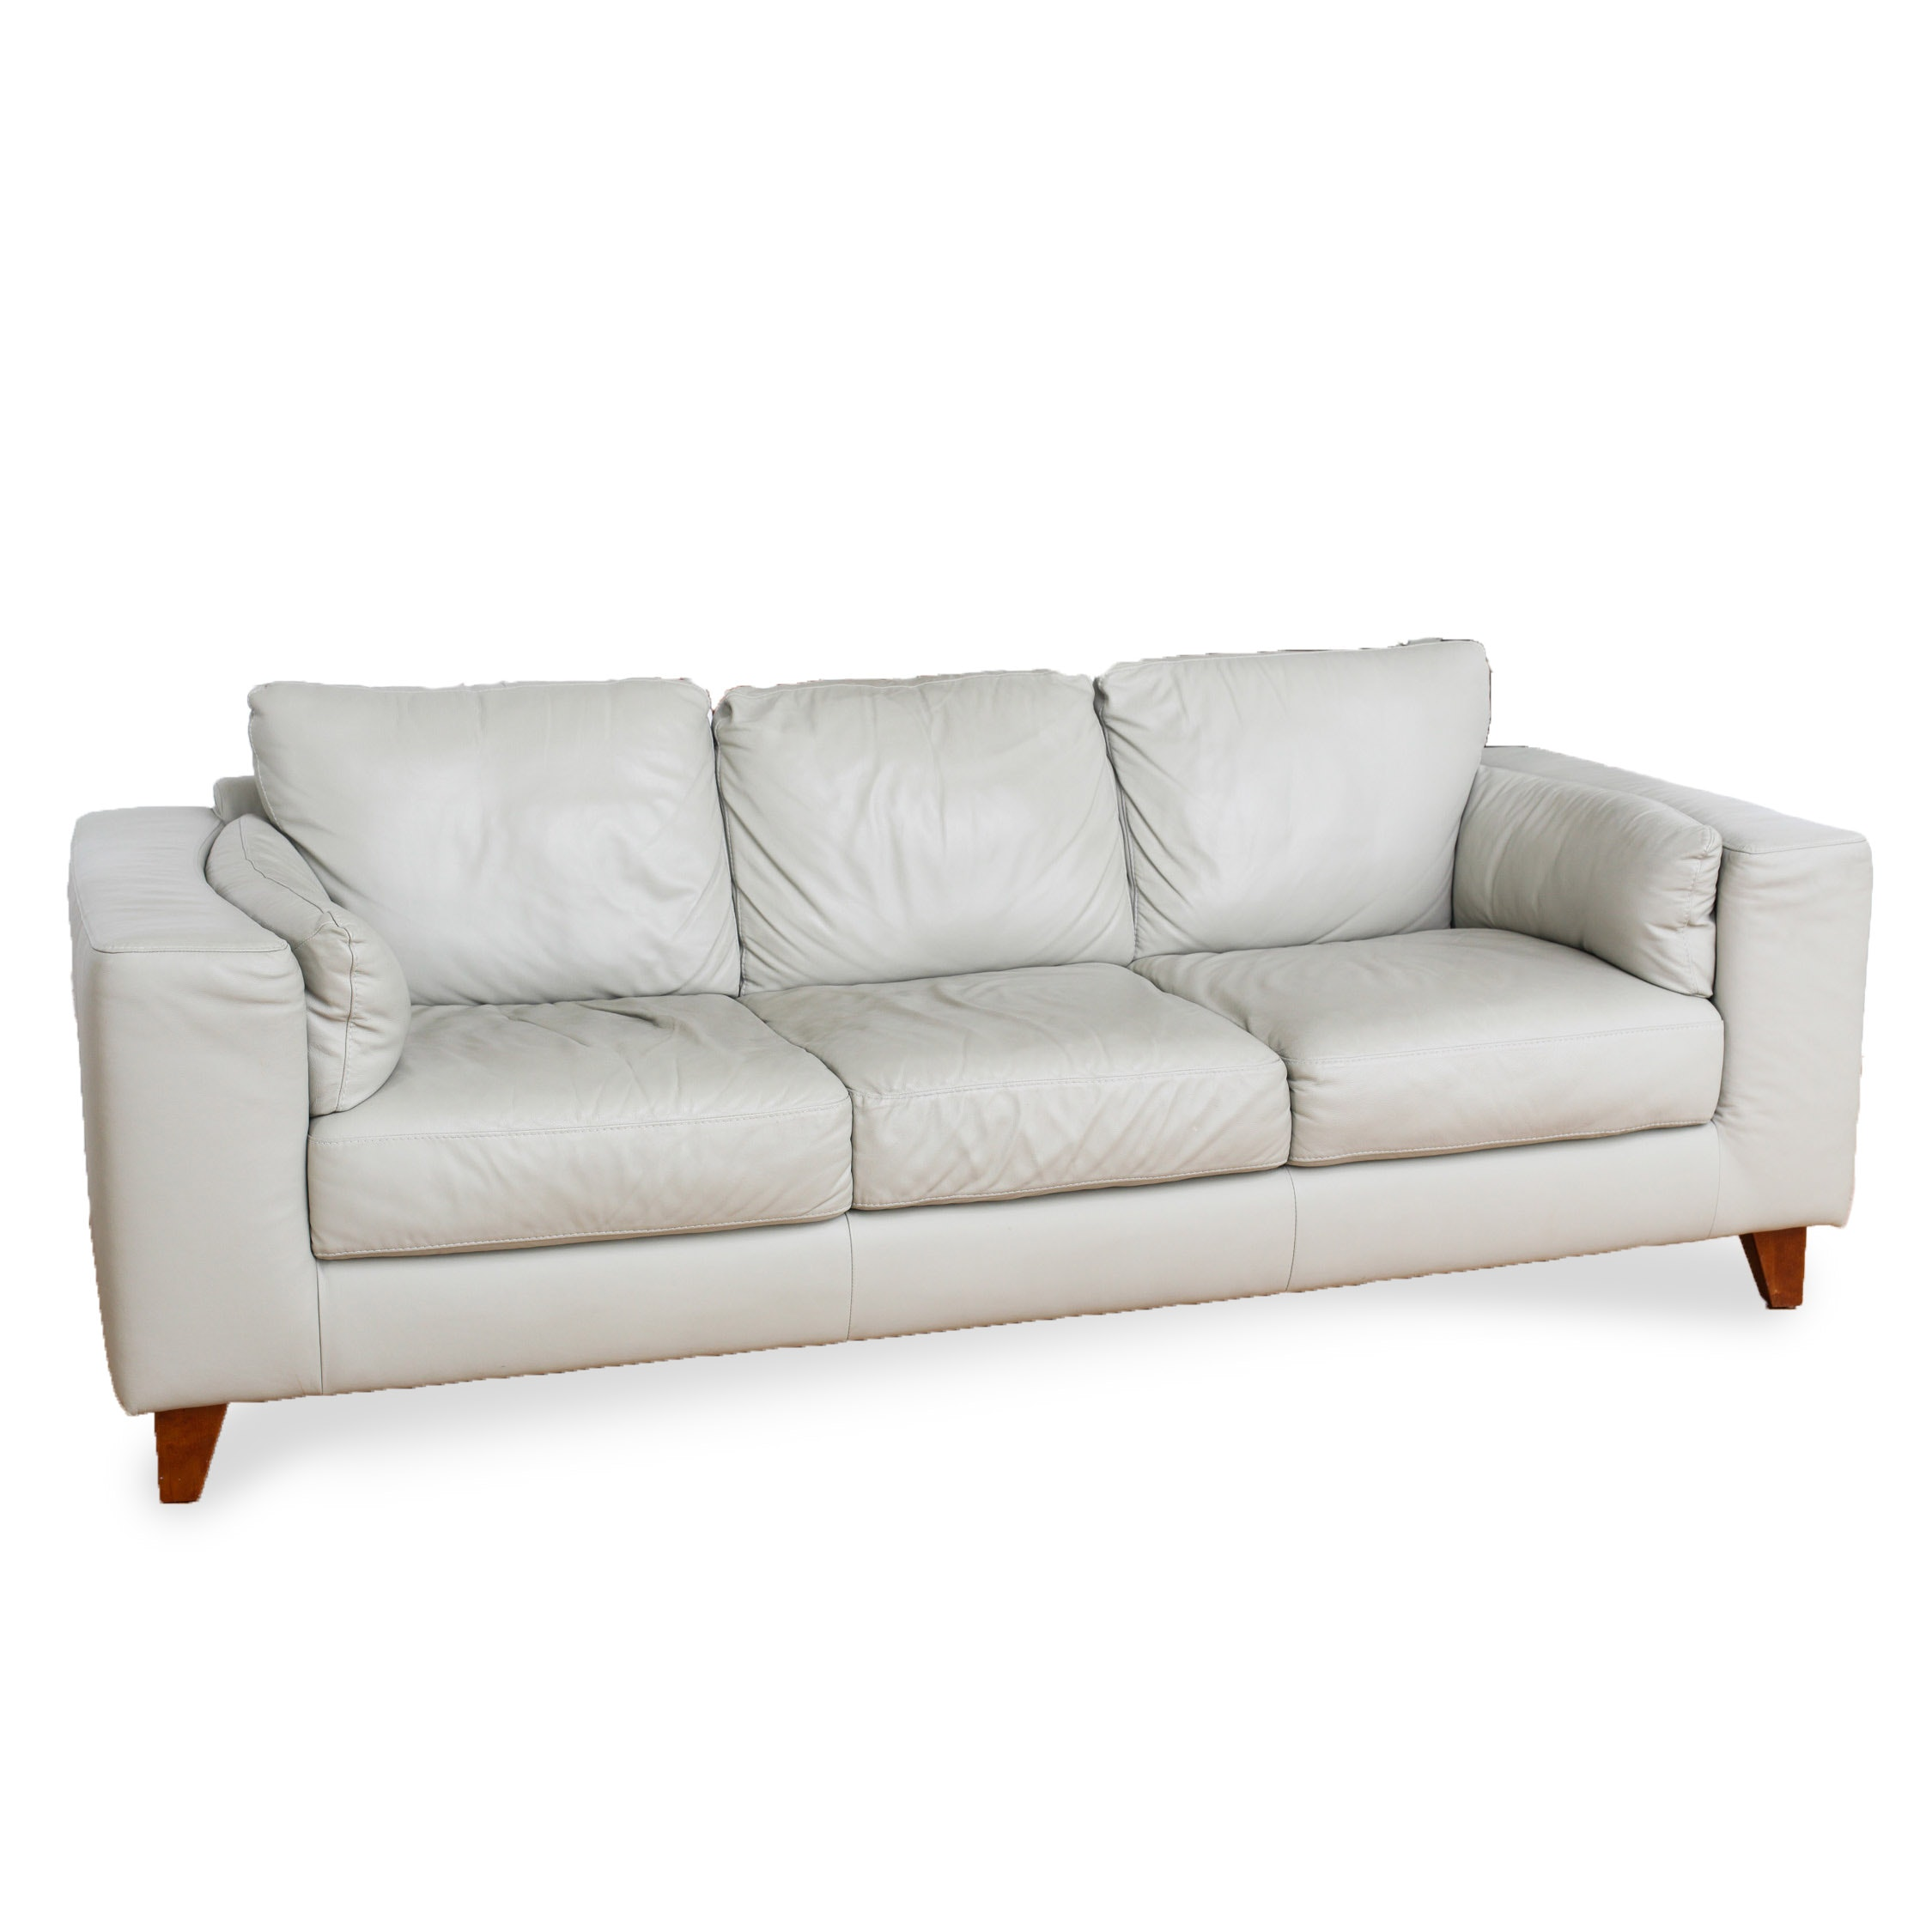 Italsofa Leather Sofa From Sprintz Furniture Nashville Ebth